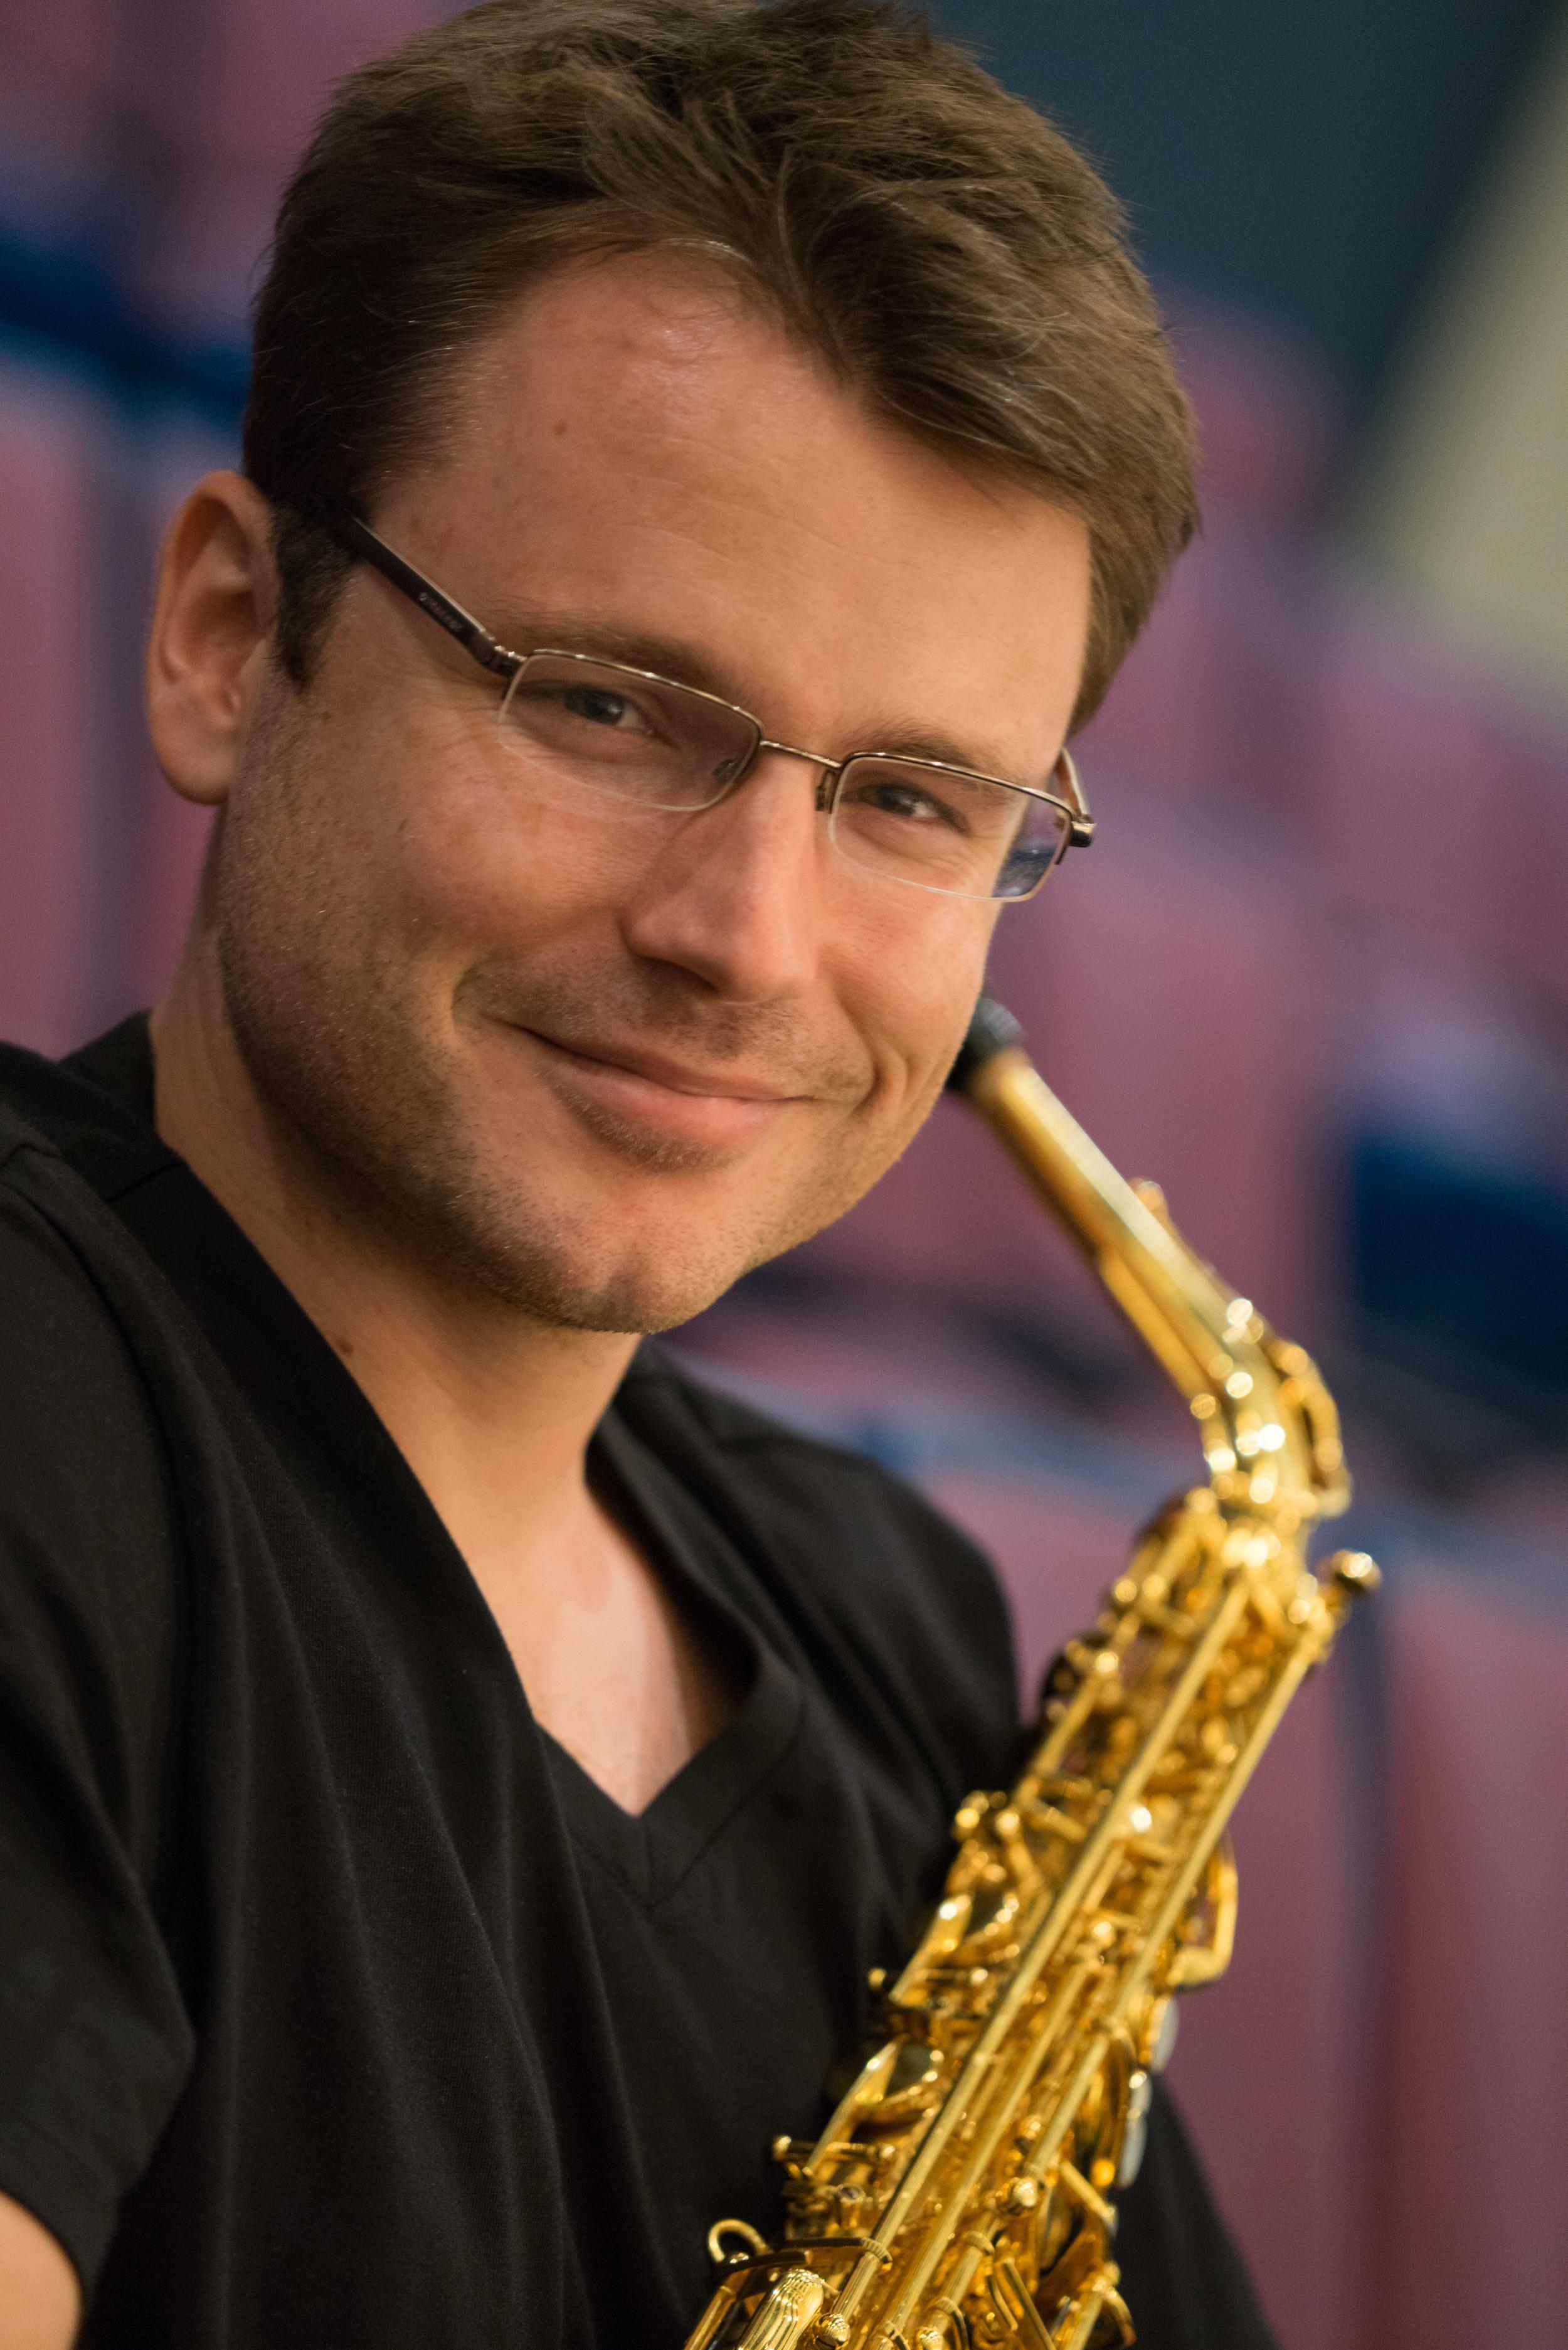 Saxophonist Nathan Nabb